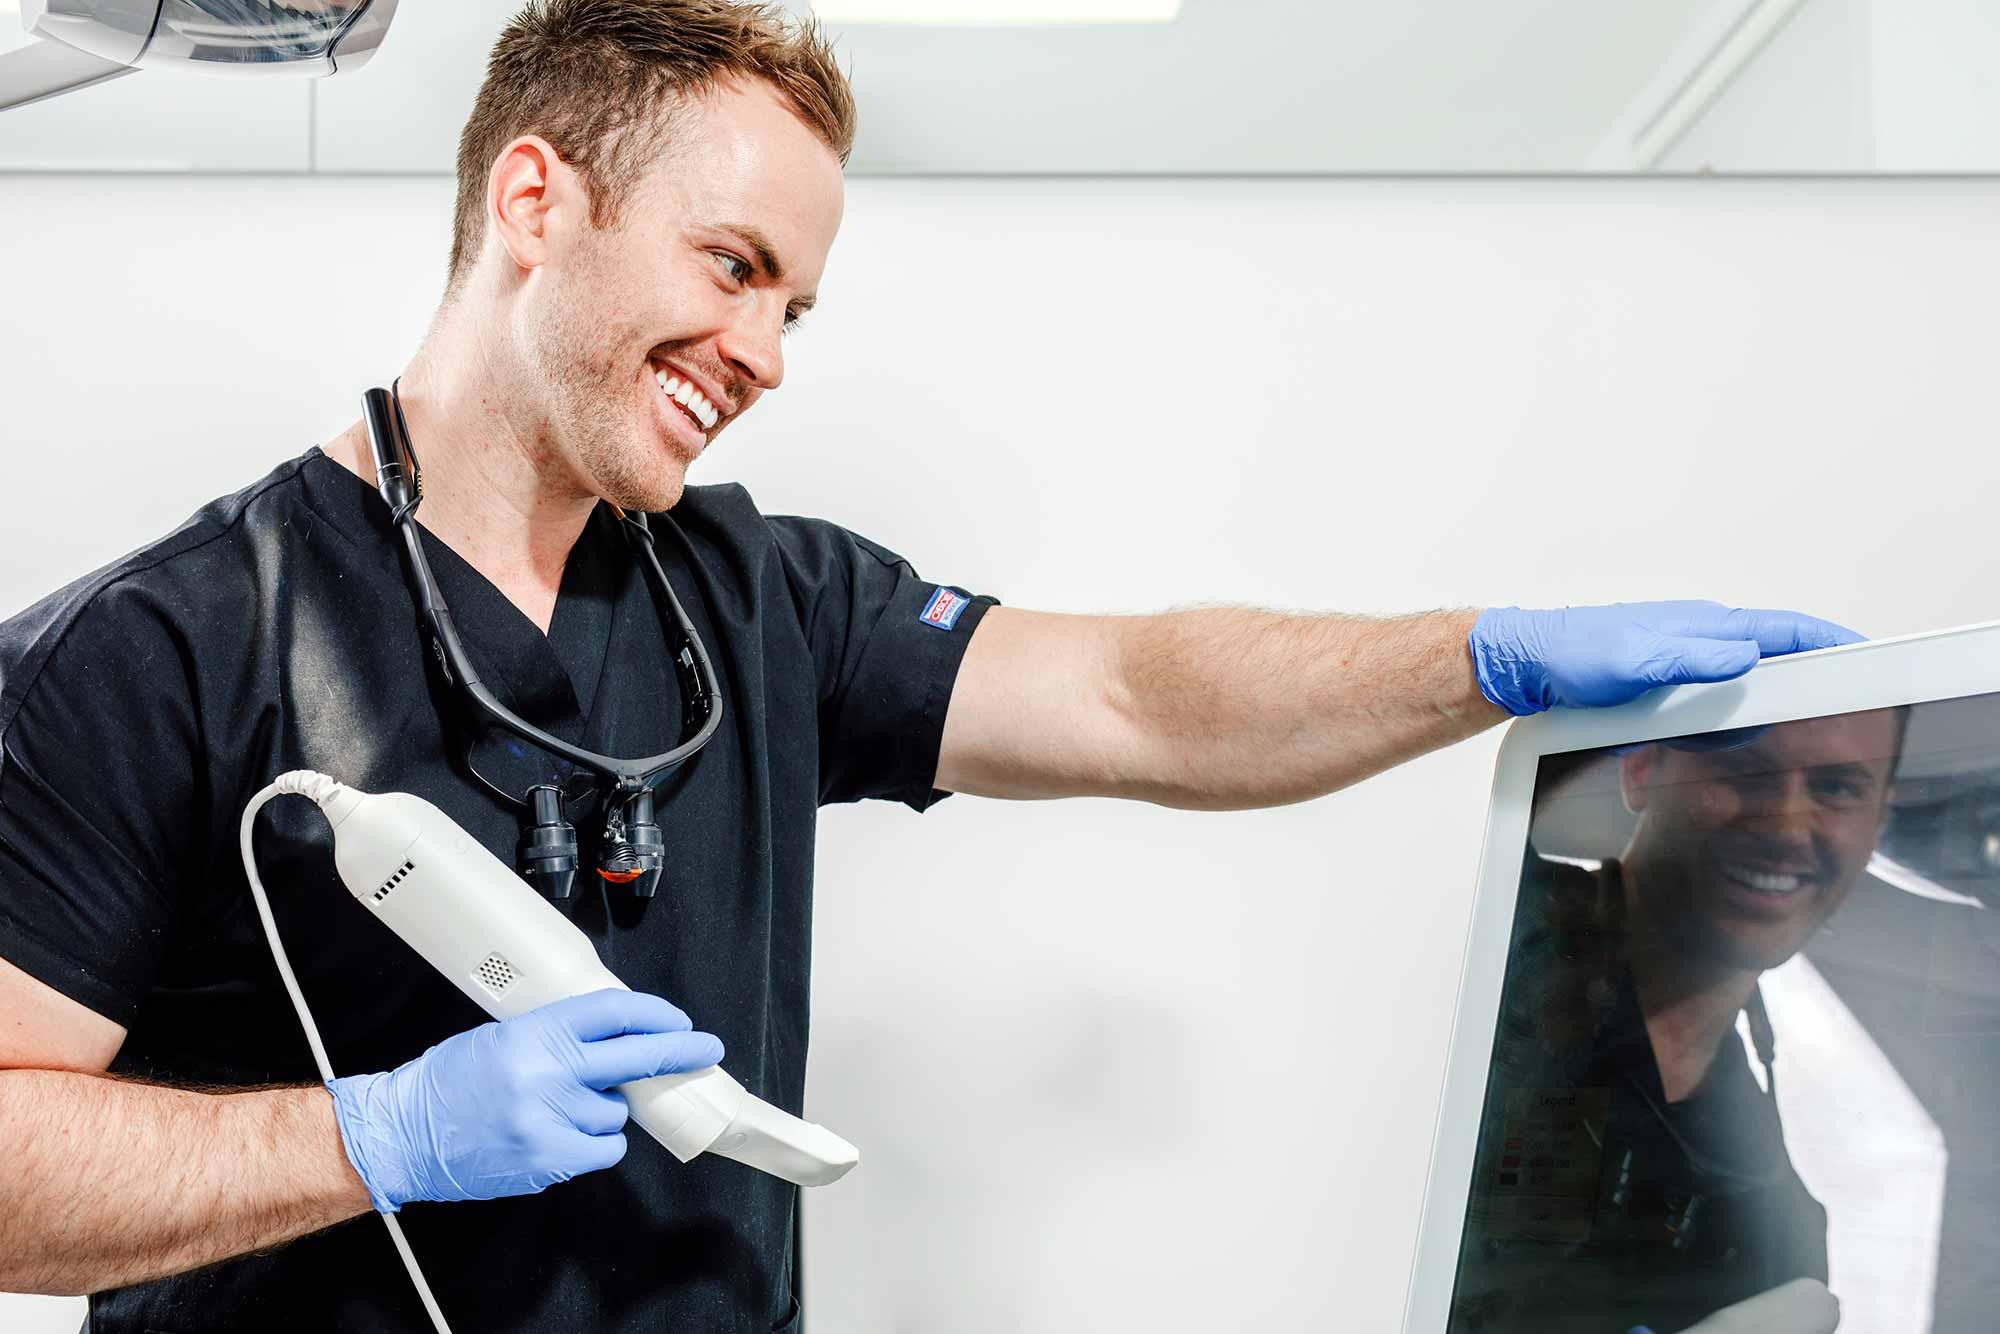 David Bretton his role as a general dentist